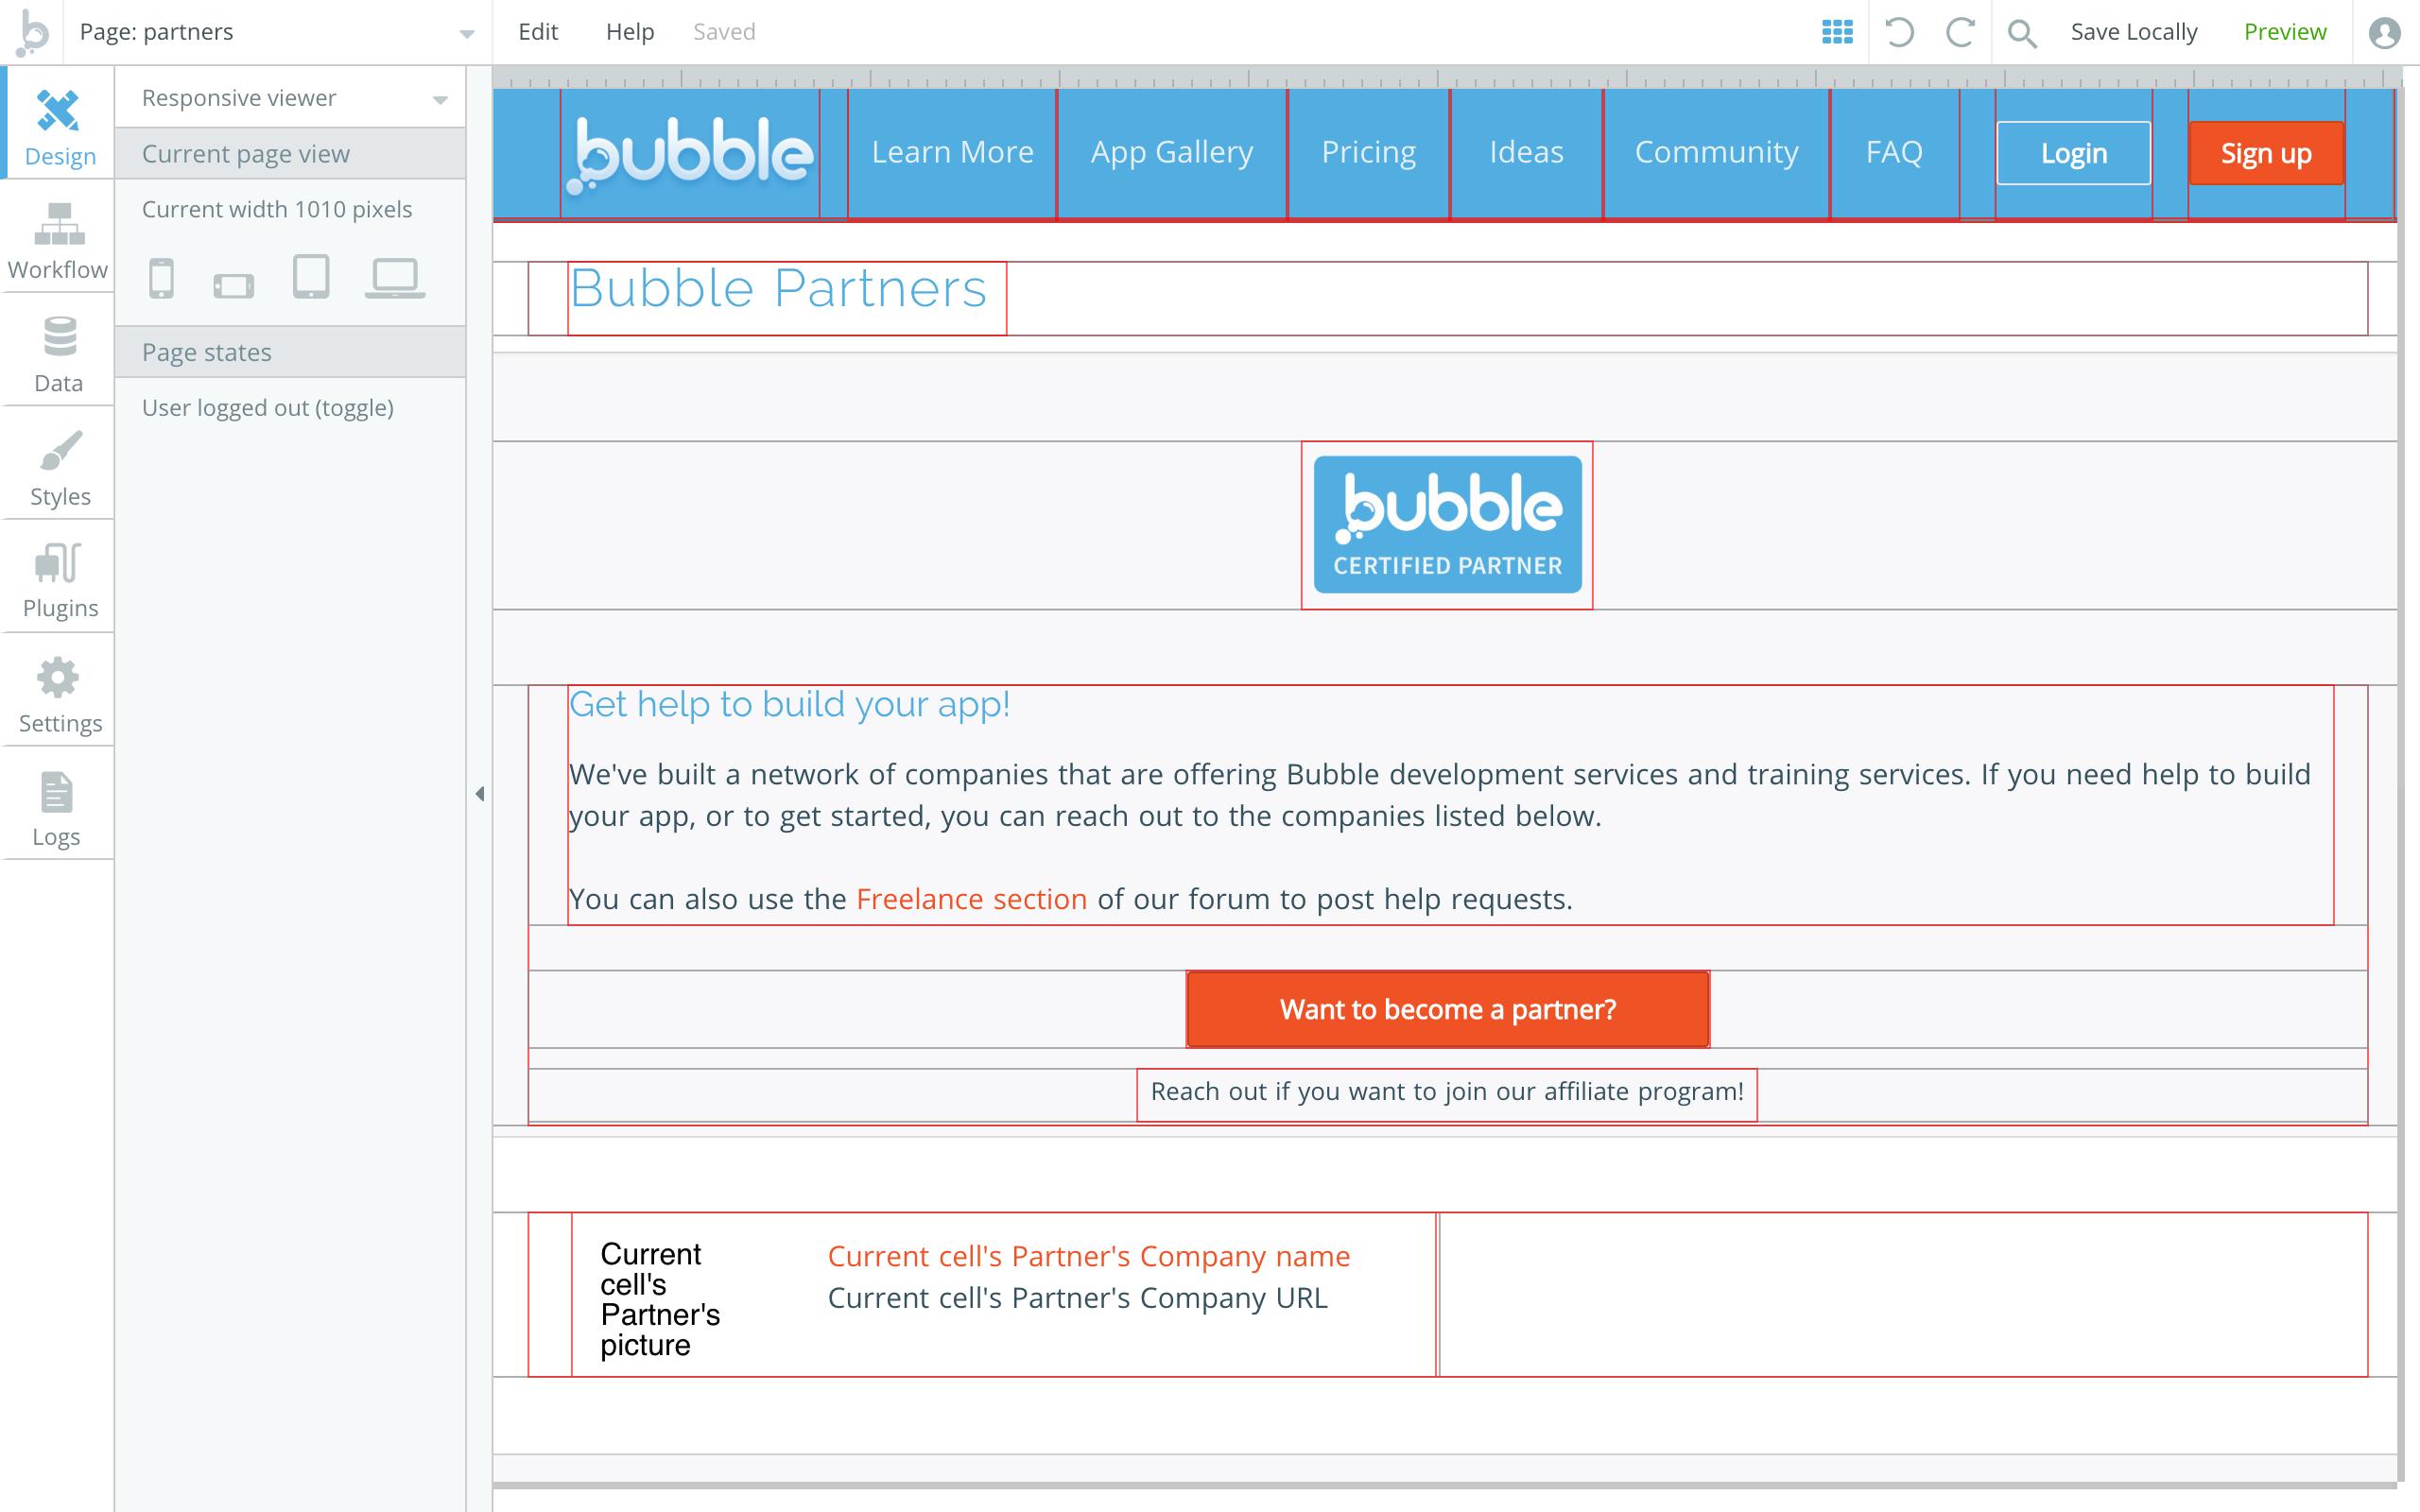 Responsive Design interface of Bubble.io